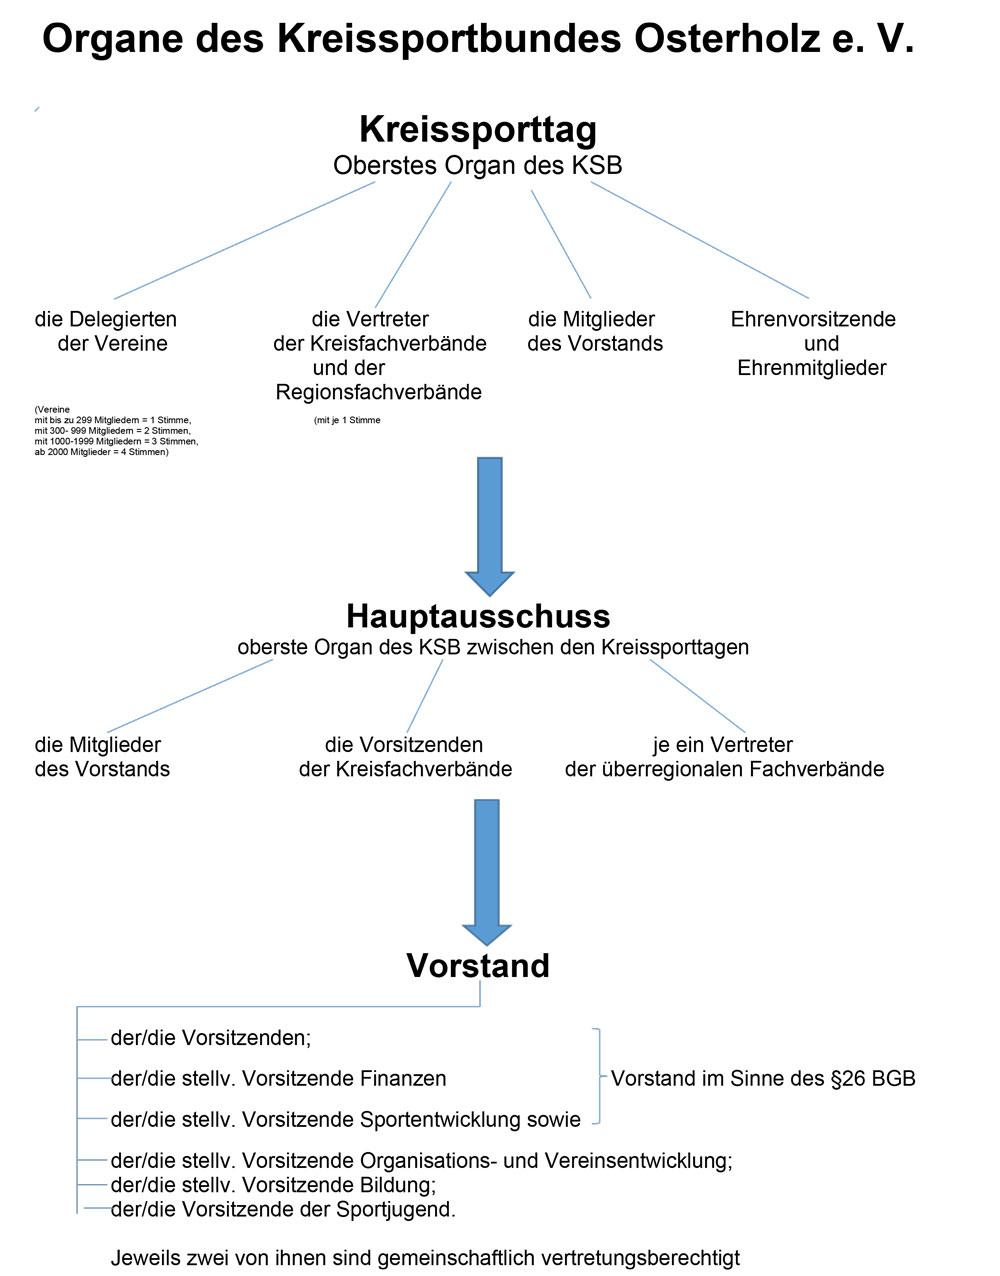 Organe des Kreissportbundes Osterholz e. V.